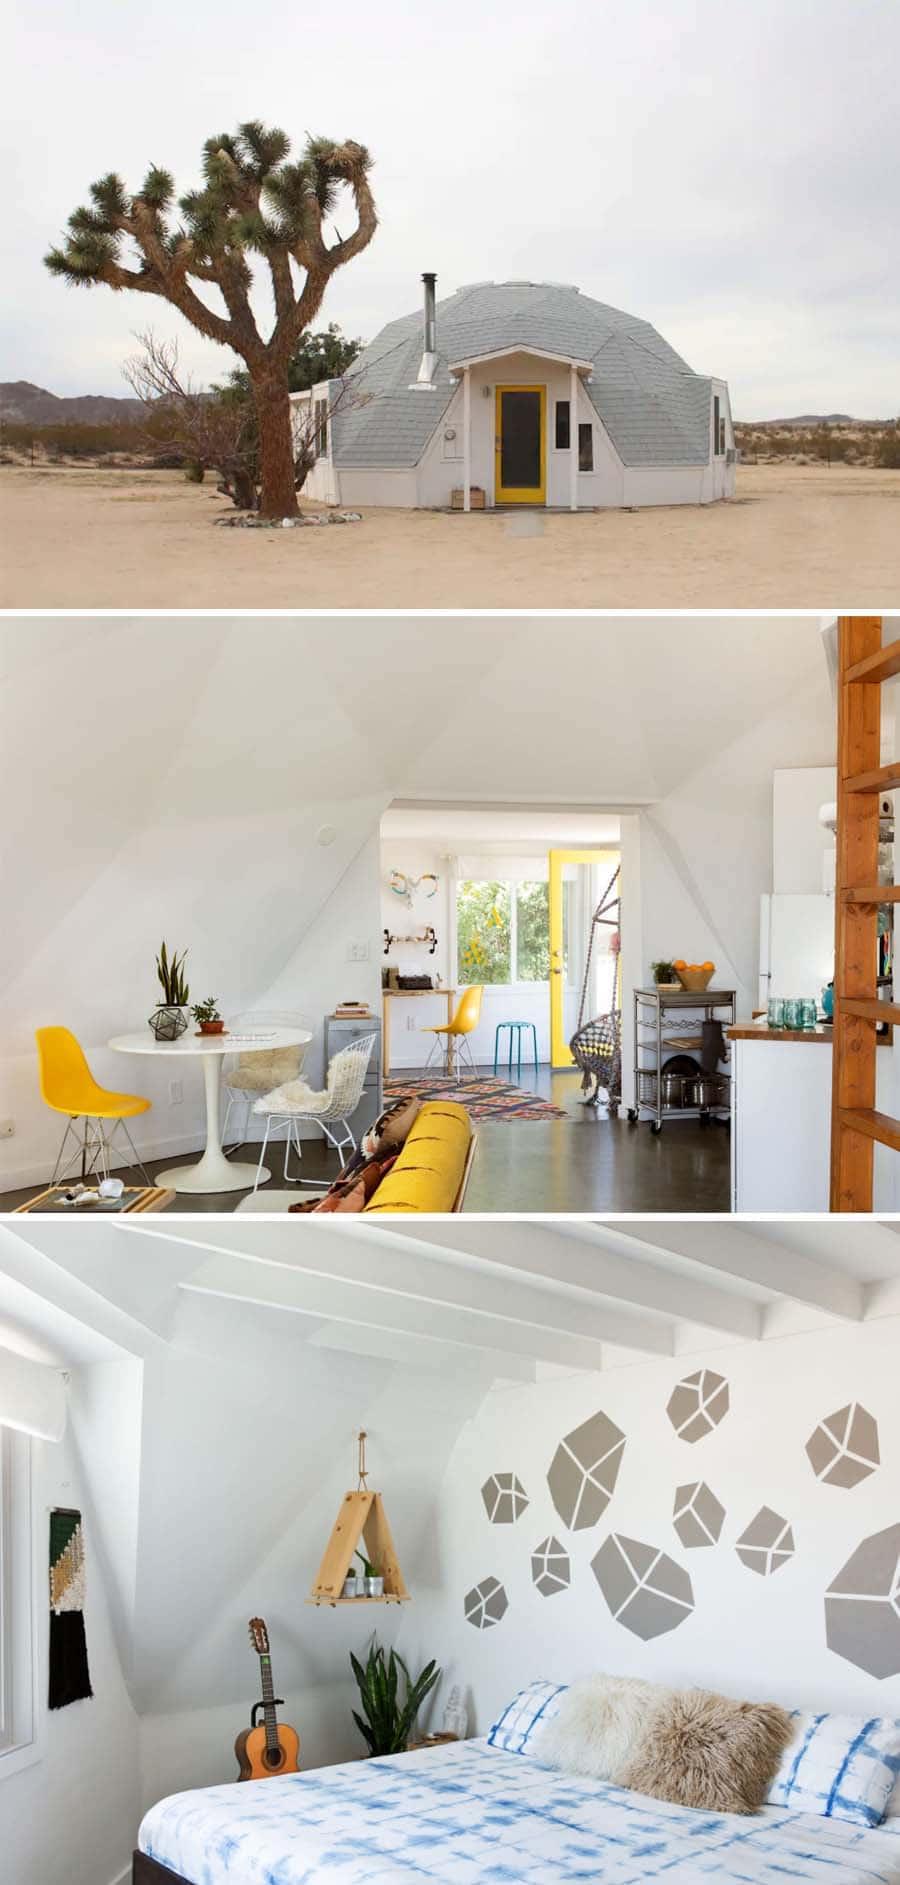 Dome in the Desert Airbnb home in Joshua Tree, California